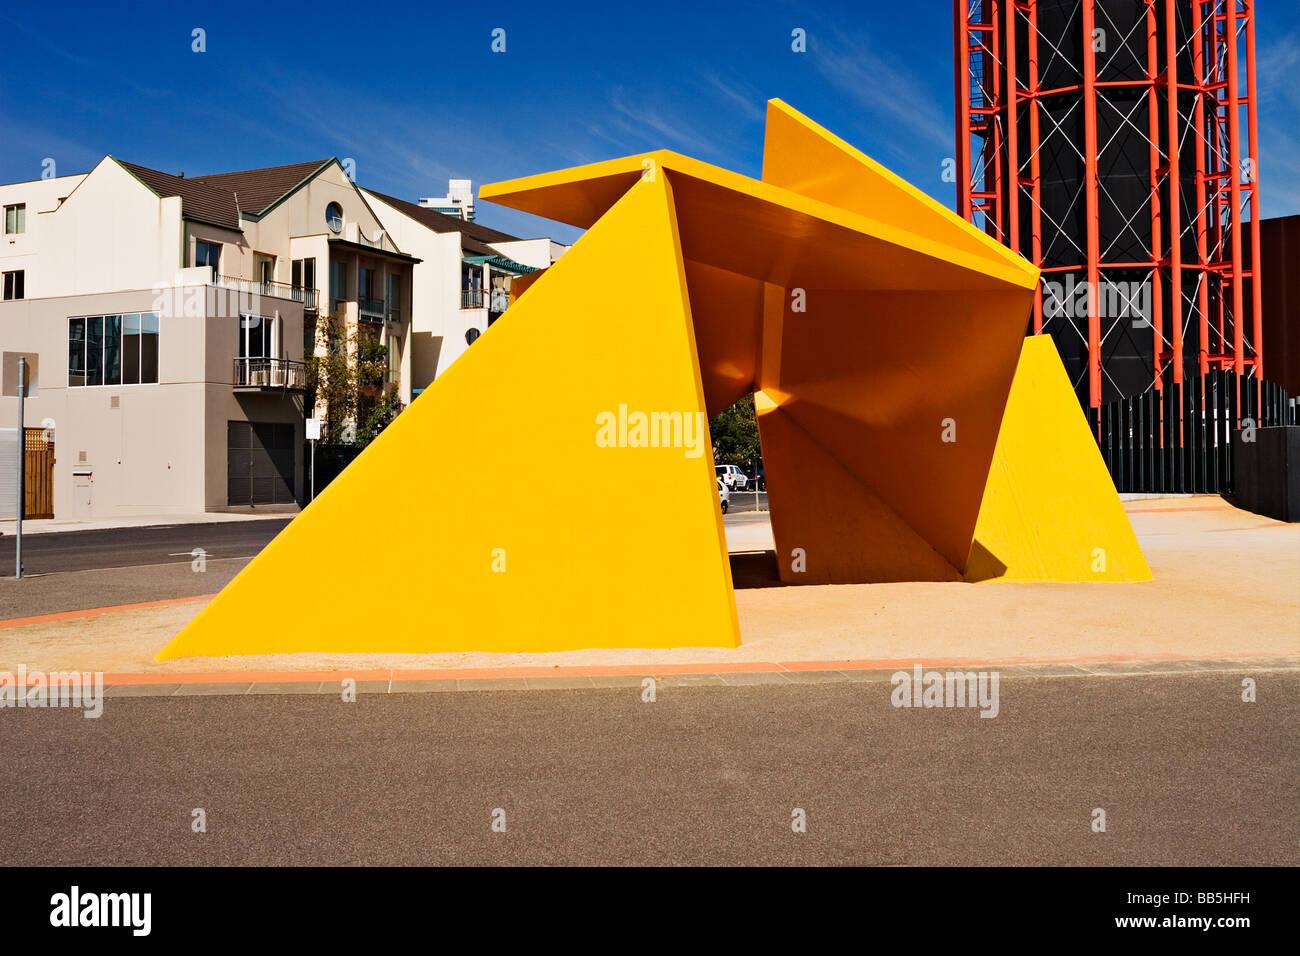 Melbourne Sculptures / The 'Vault sculpture' is one of Melbourne`s 'Public Art' sculptures.Melbourne - Stock Image